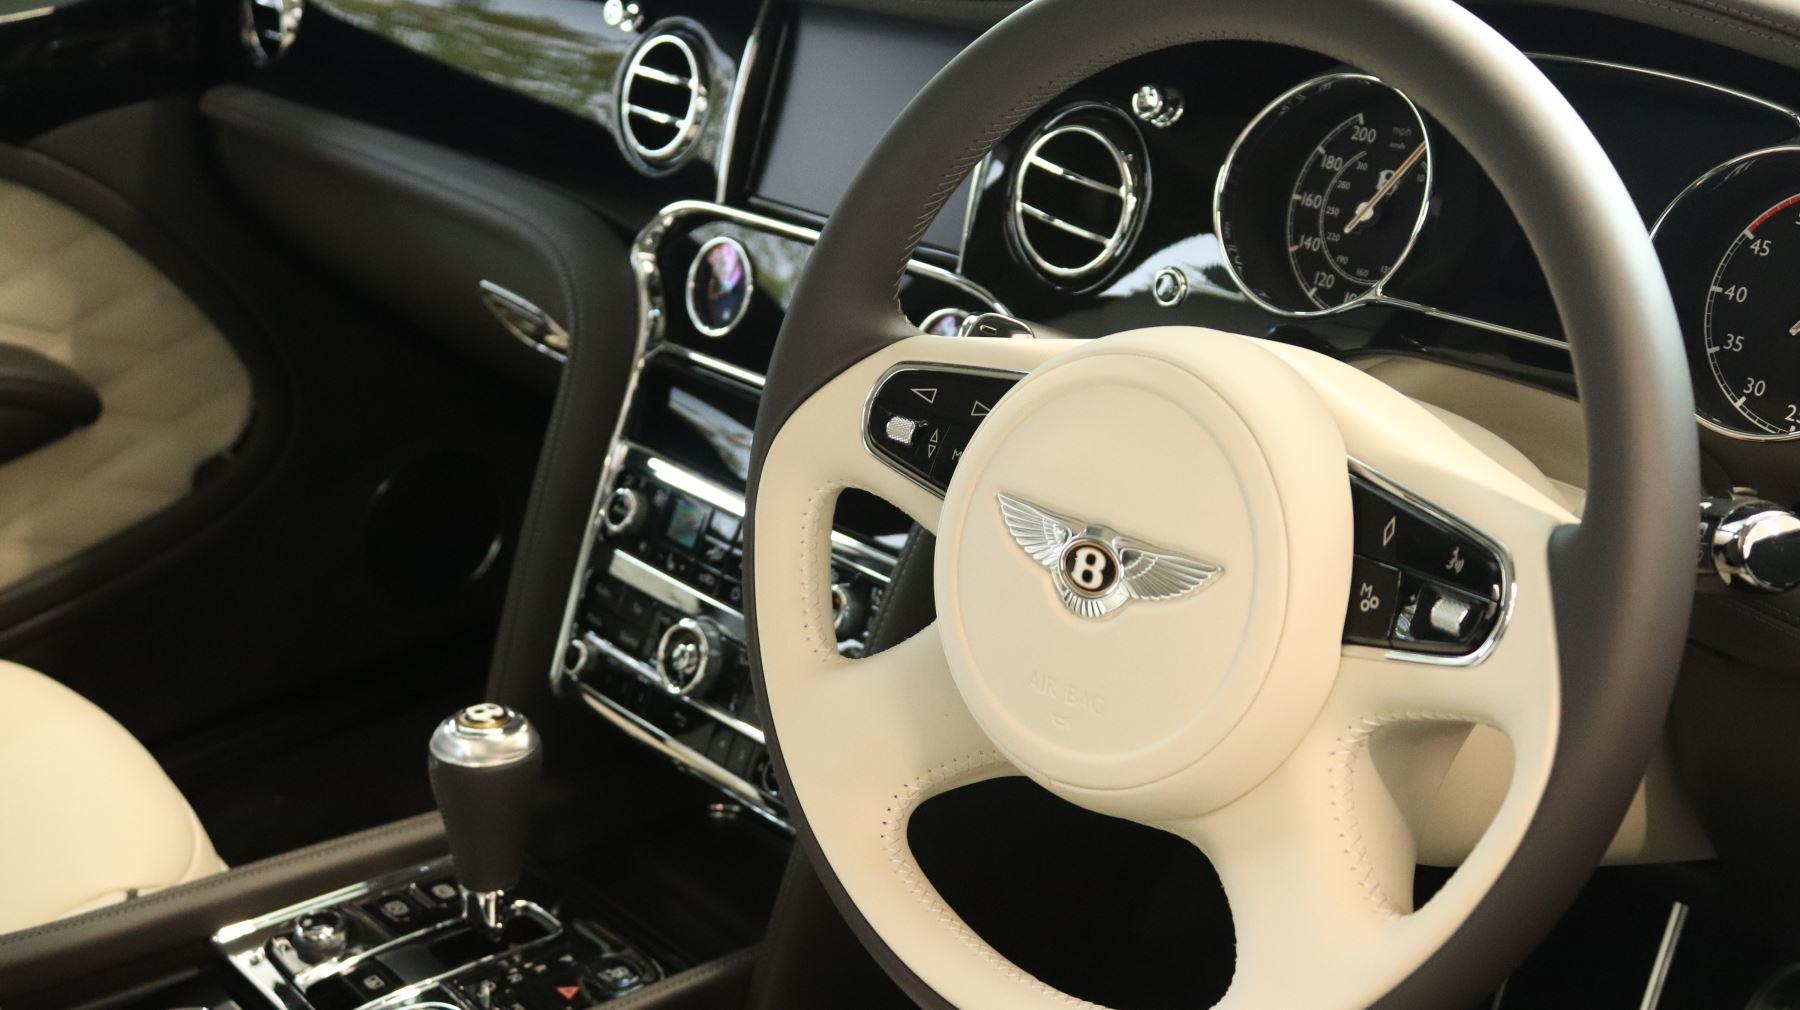 Bentley Mulsanne Speed 6.8 V8 Speed Auto image 2